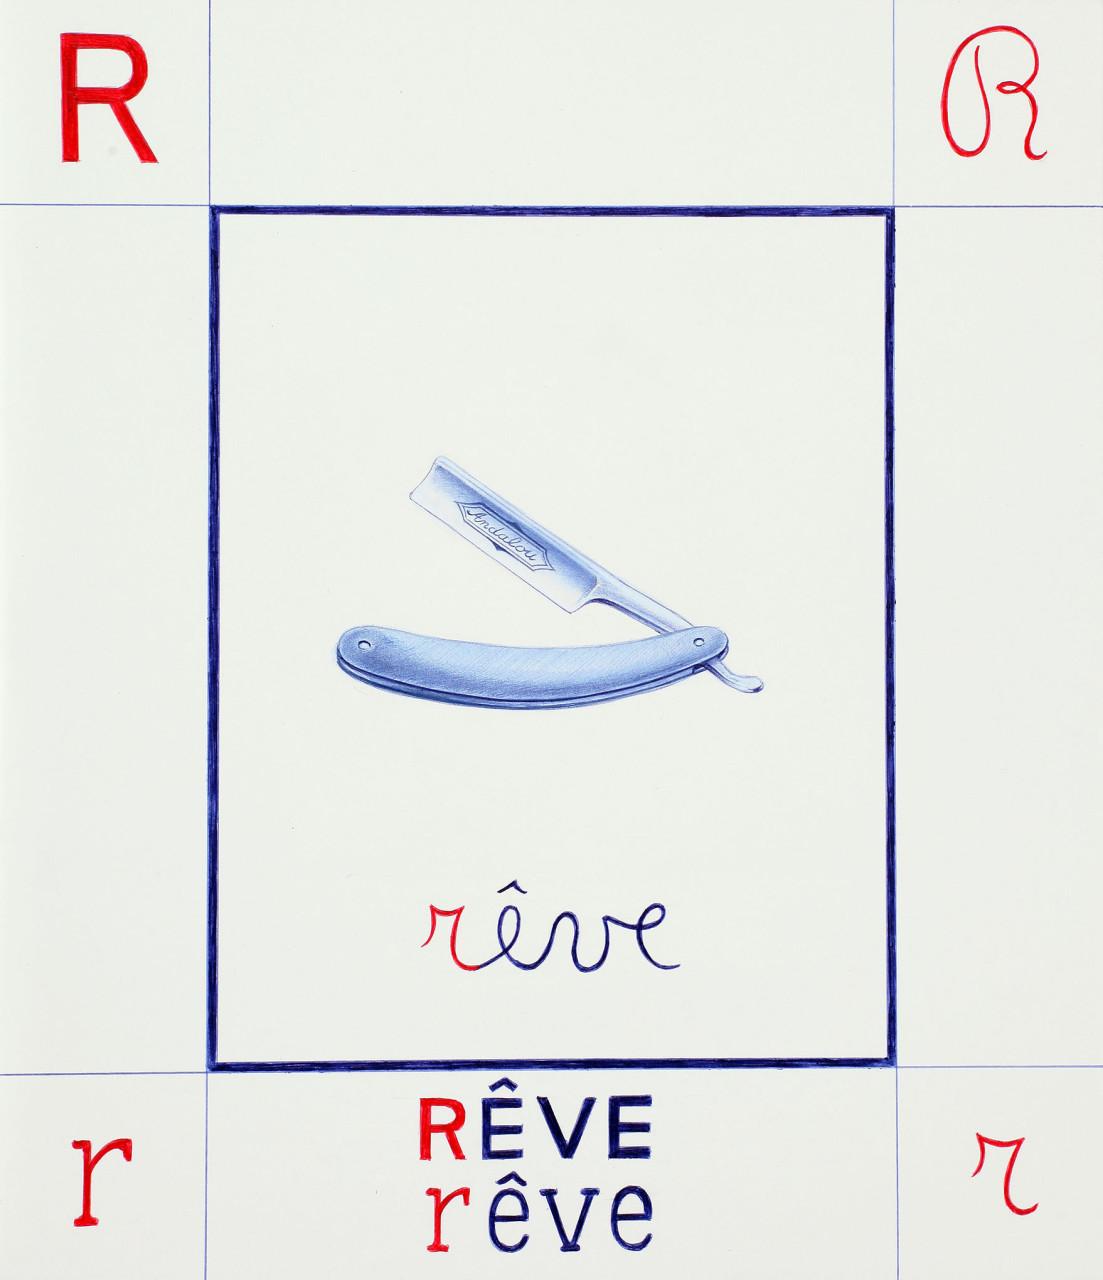 13R-reve_bassa